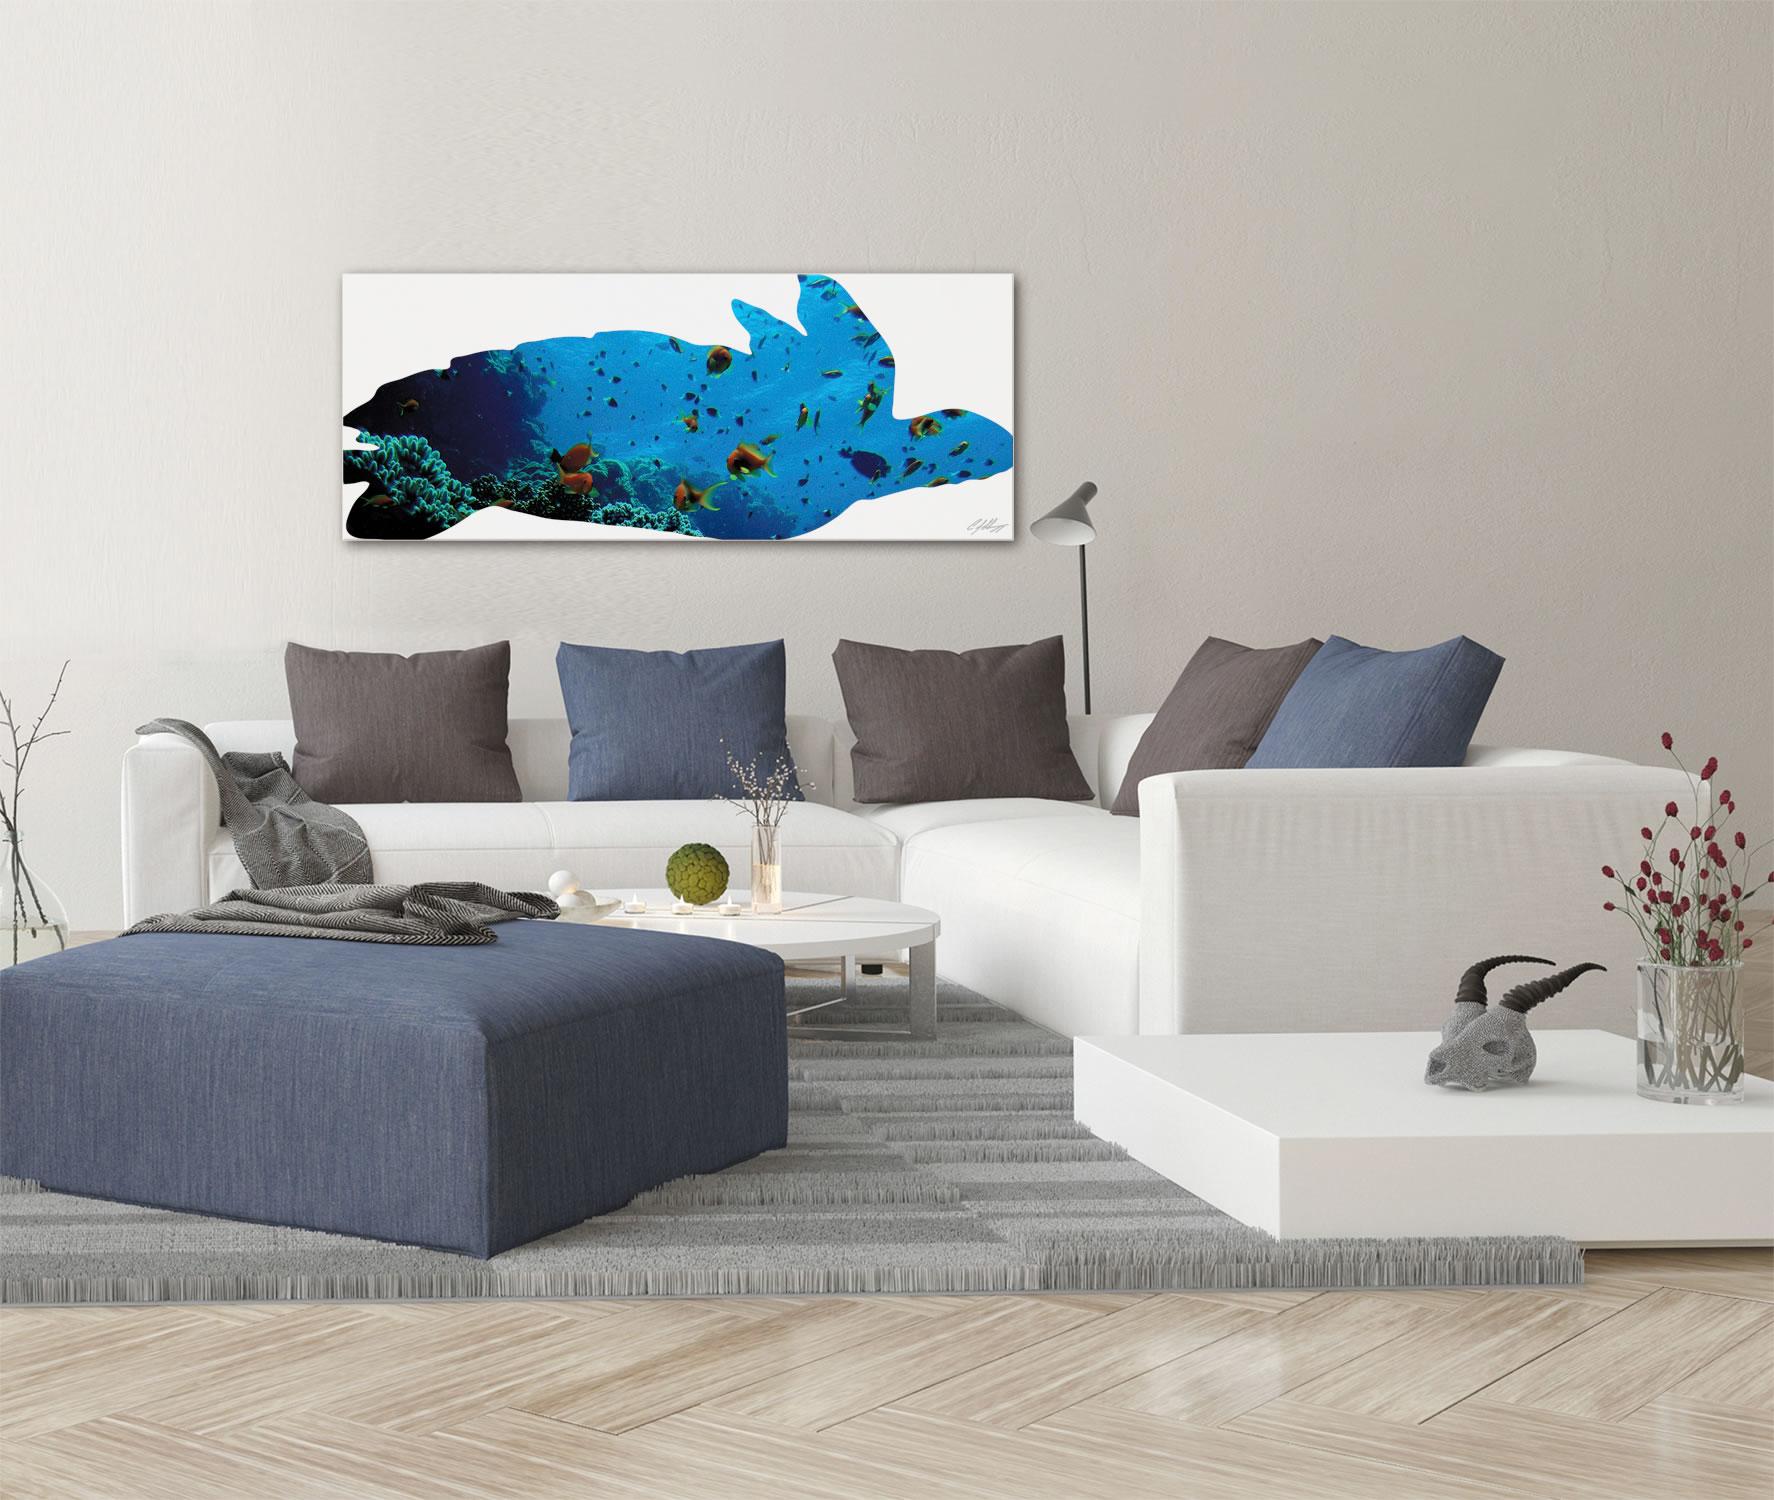 SEA TURTLE SEASCAPE - 48x19 in. Metal Animal Print - Lifestyle Image